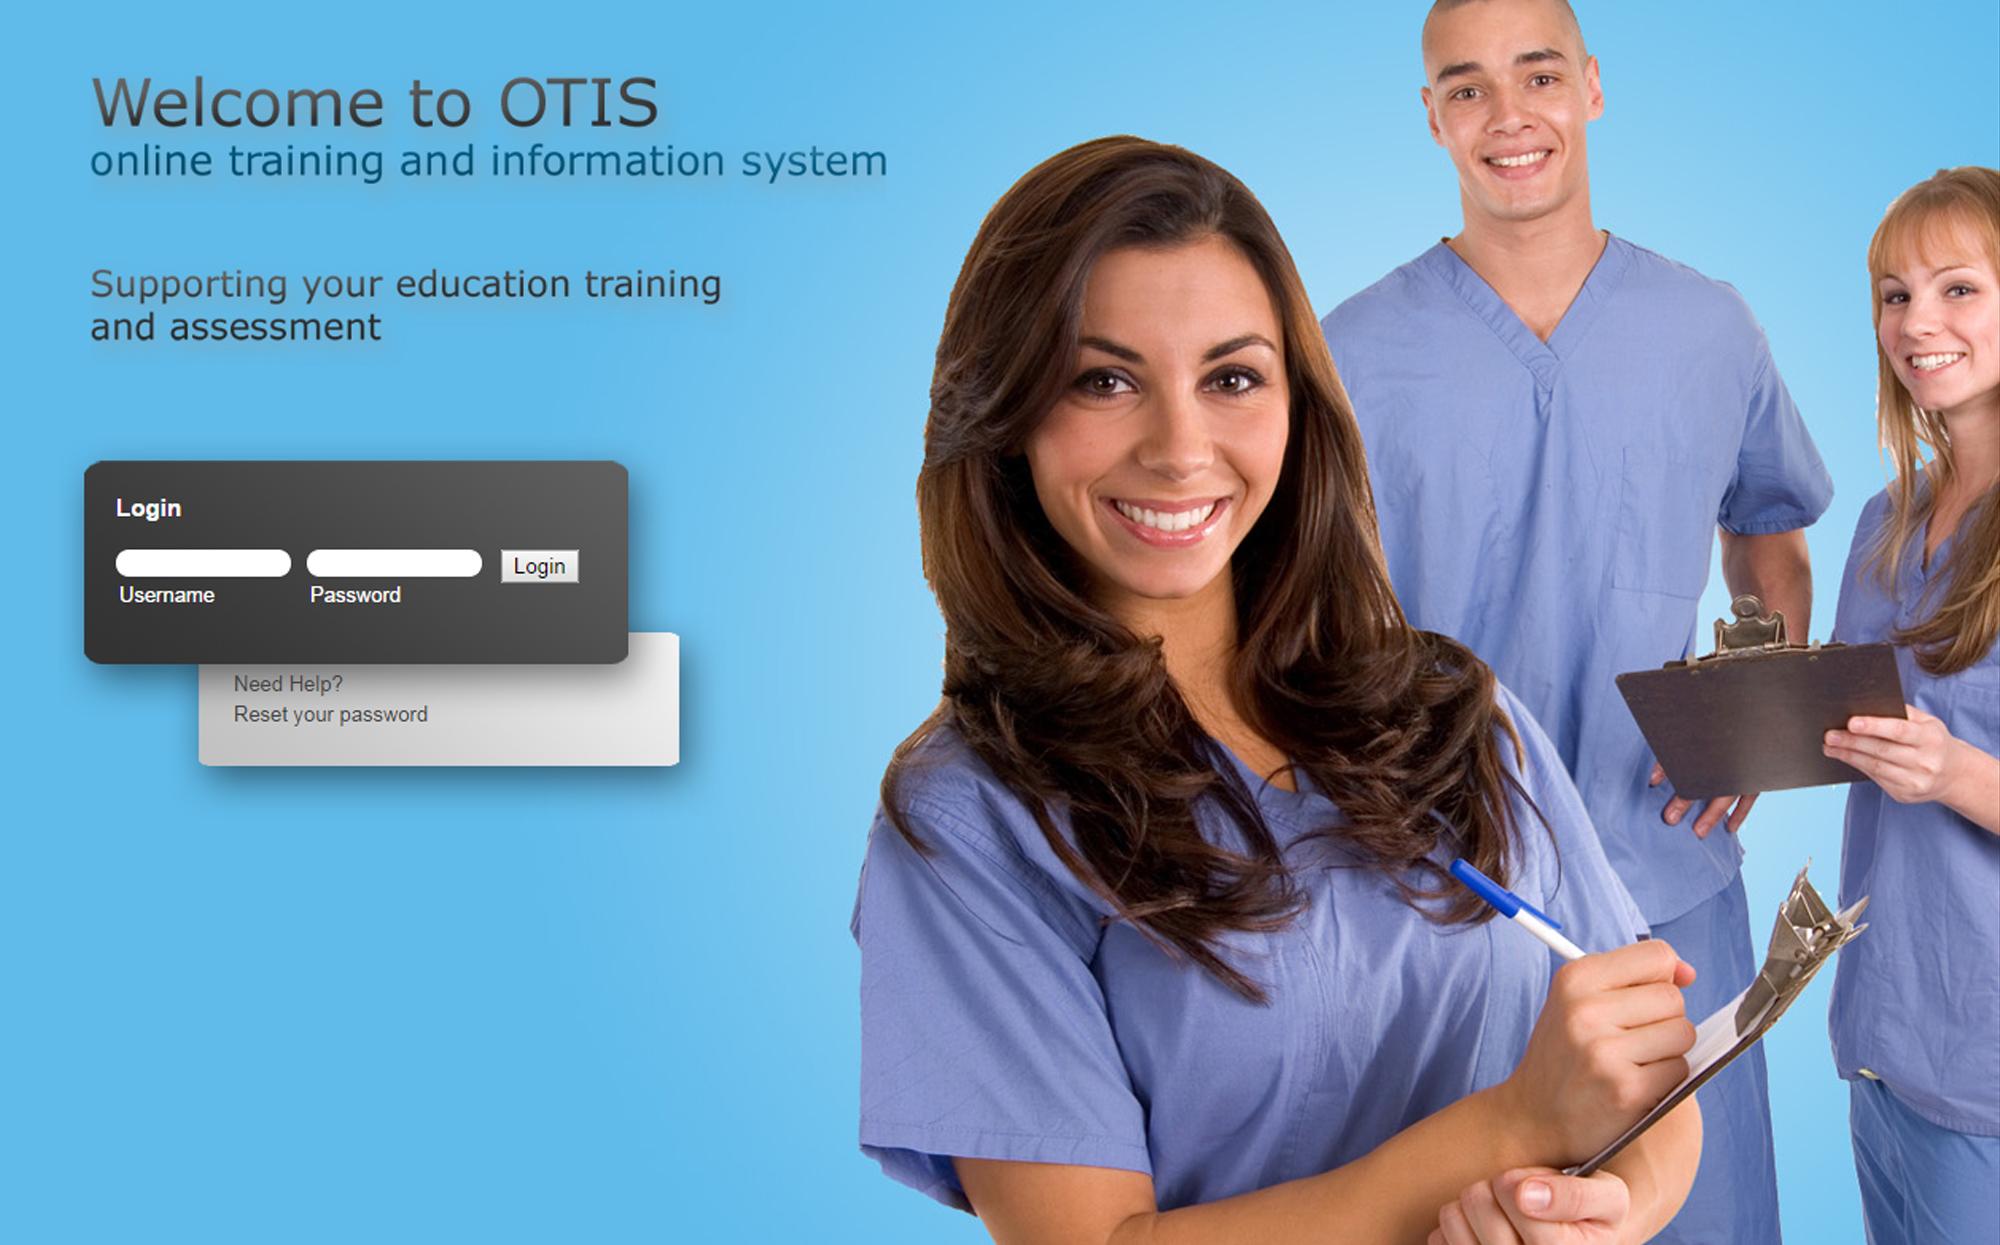 OTIS_Frontpage V2